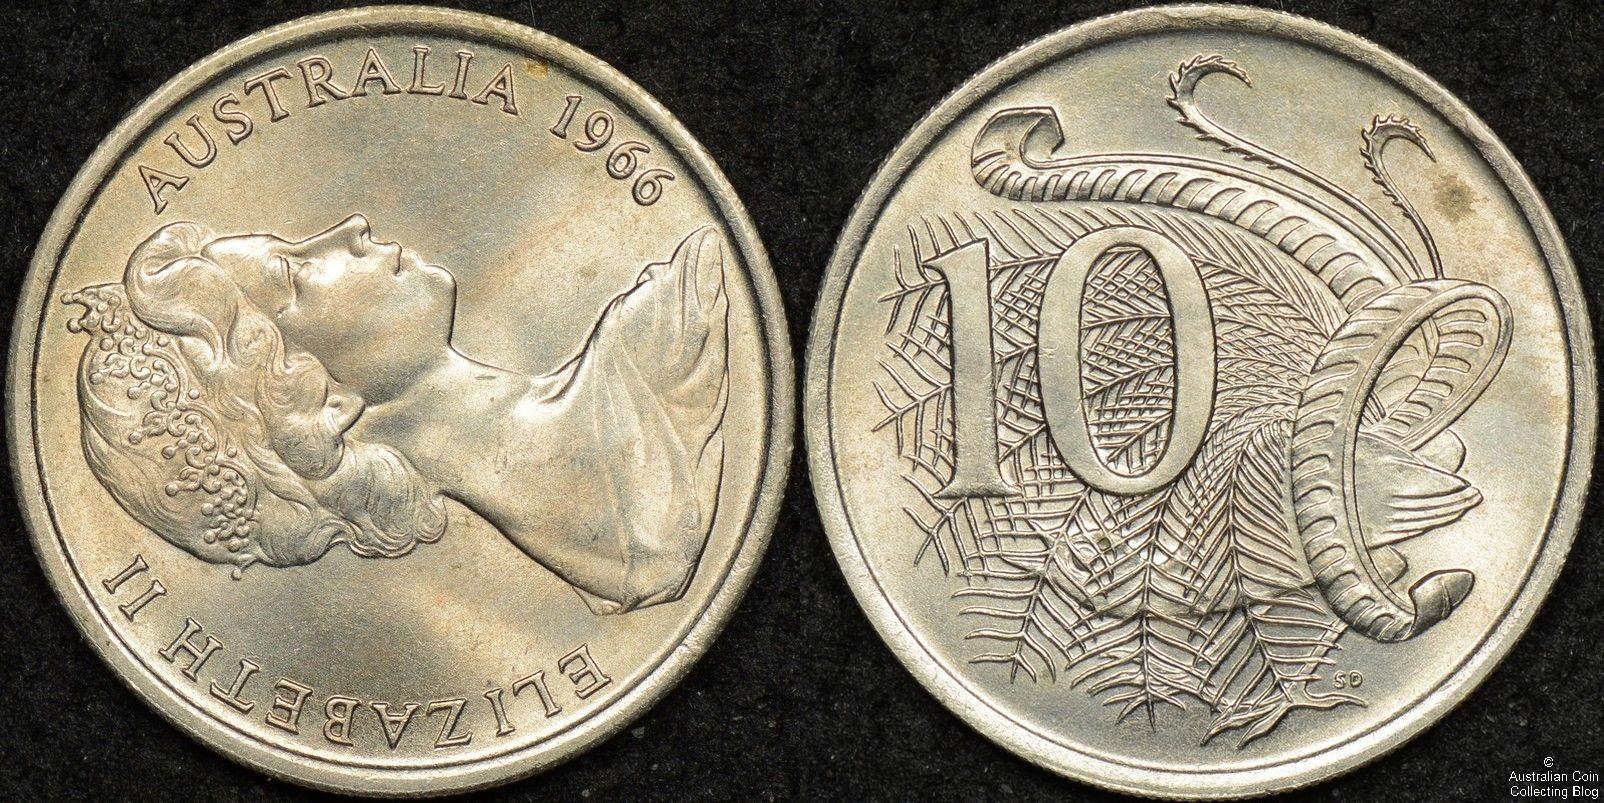 Australia 1966(L) 10 Cent PCGS MS65 Upset Variety